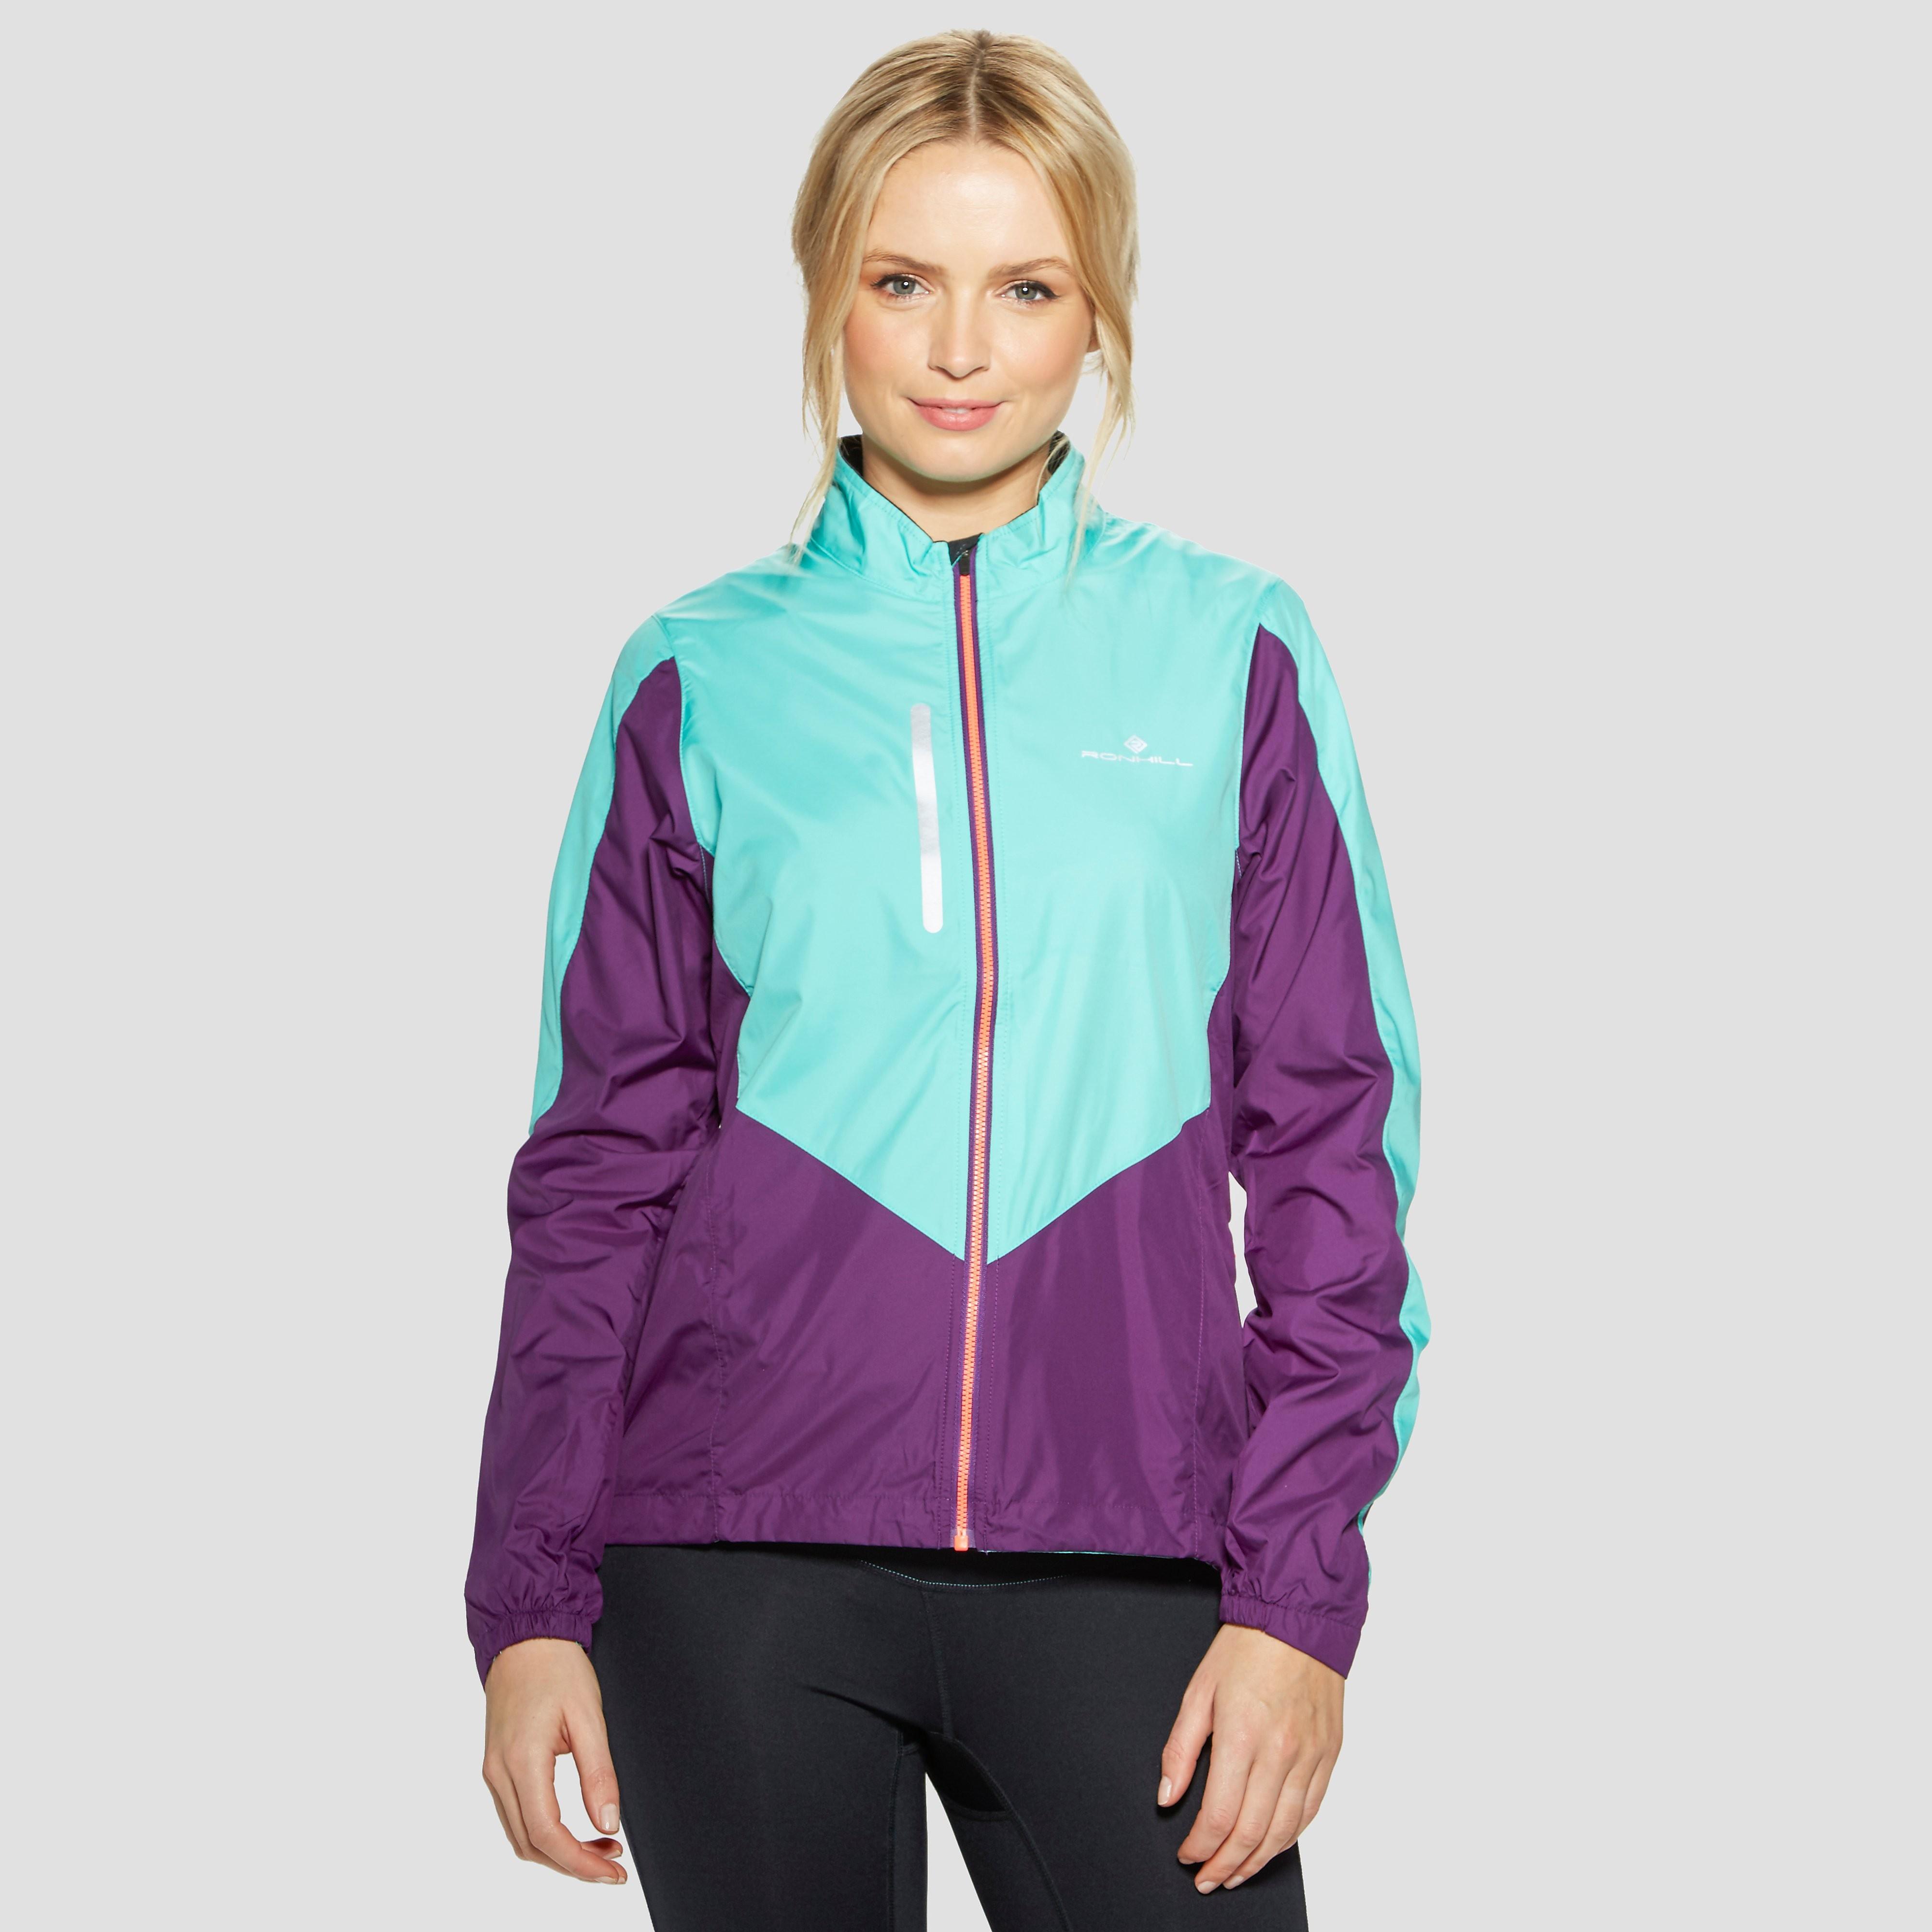 Ronhill Windlite Women's Running Jacket